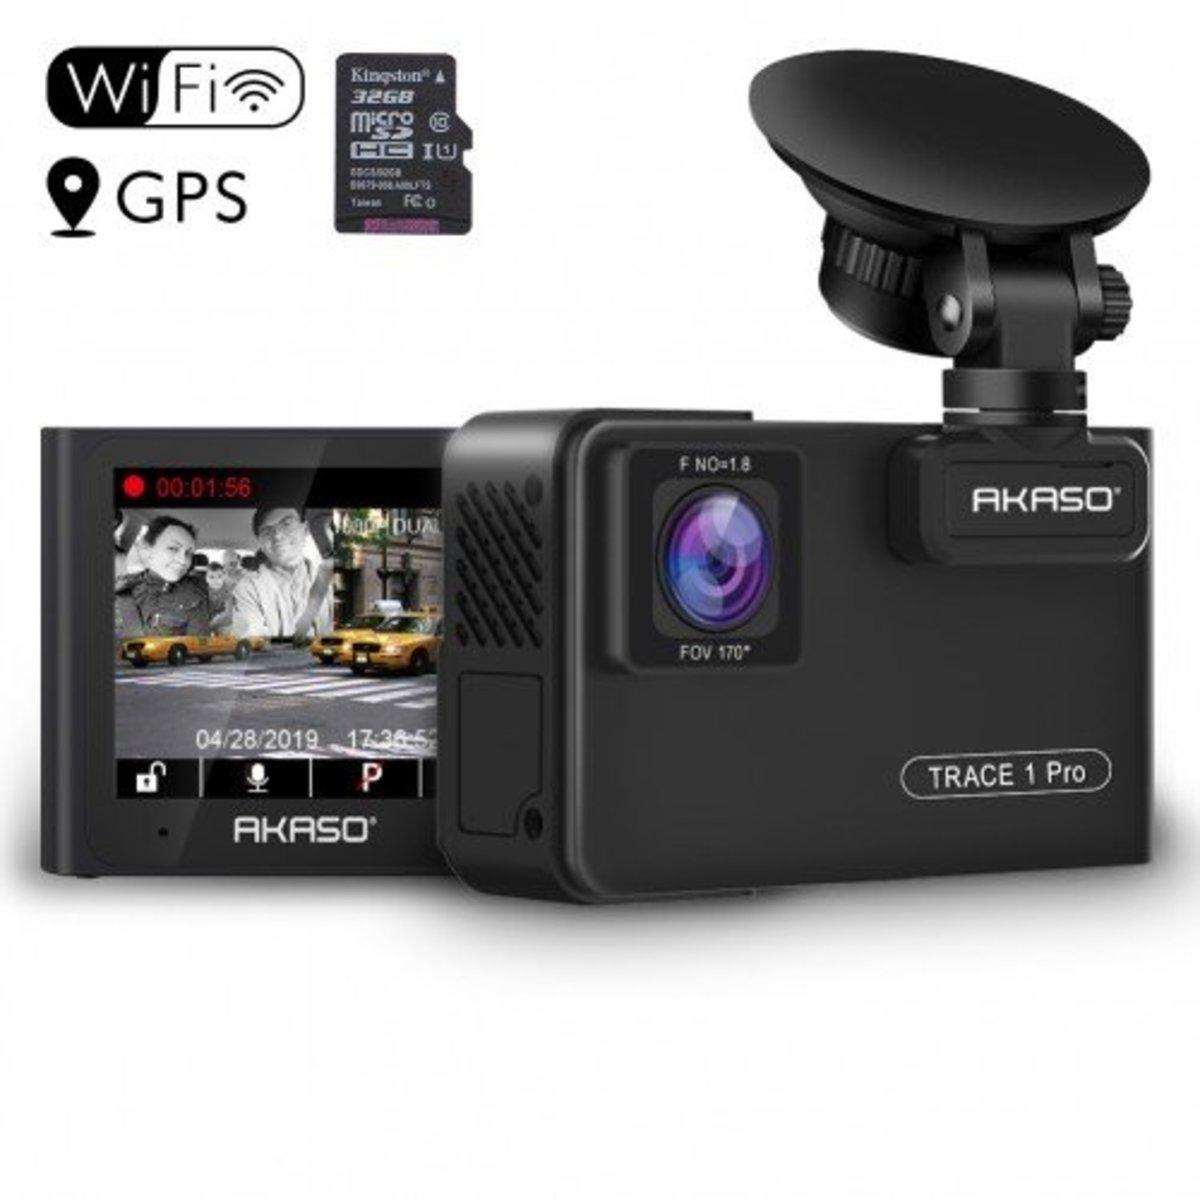 Akaso Trace 1 Pro Dash Cam Comprehensive Review